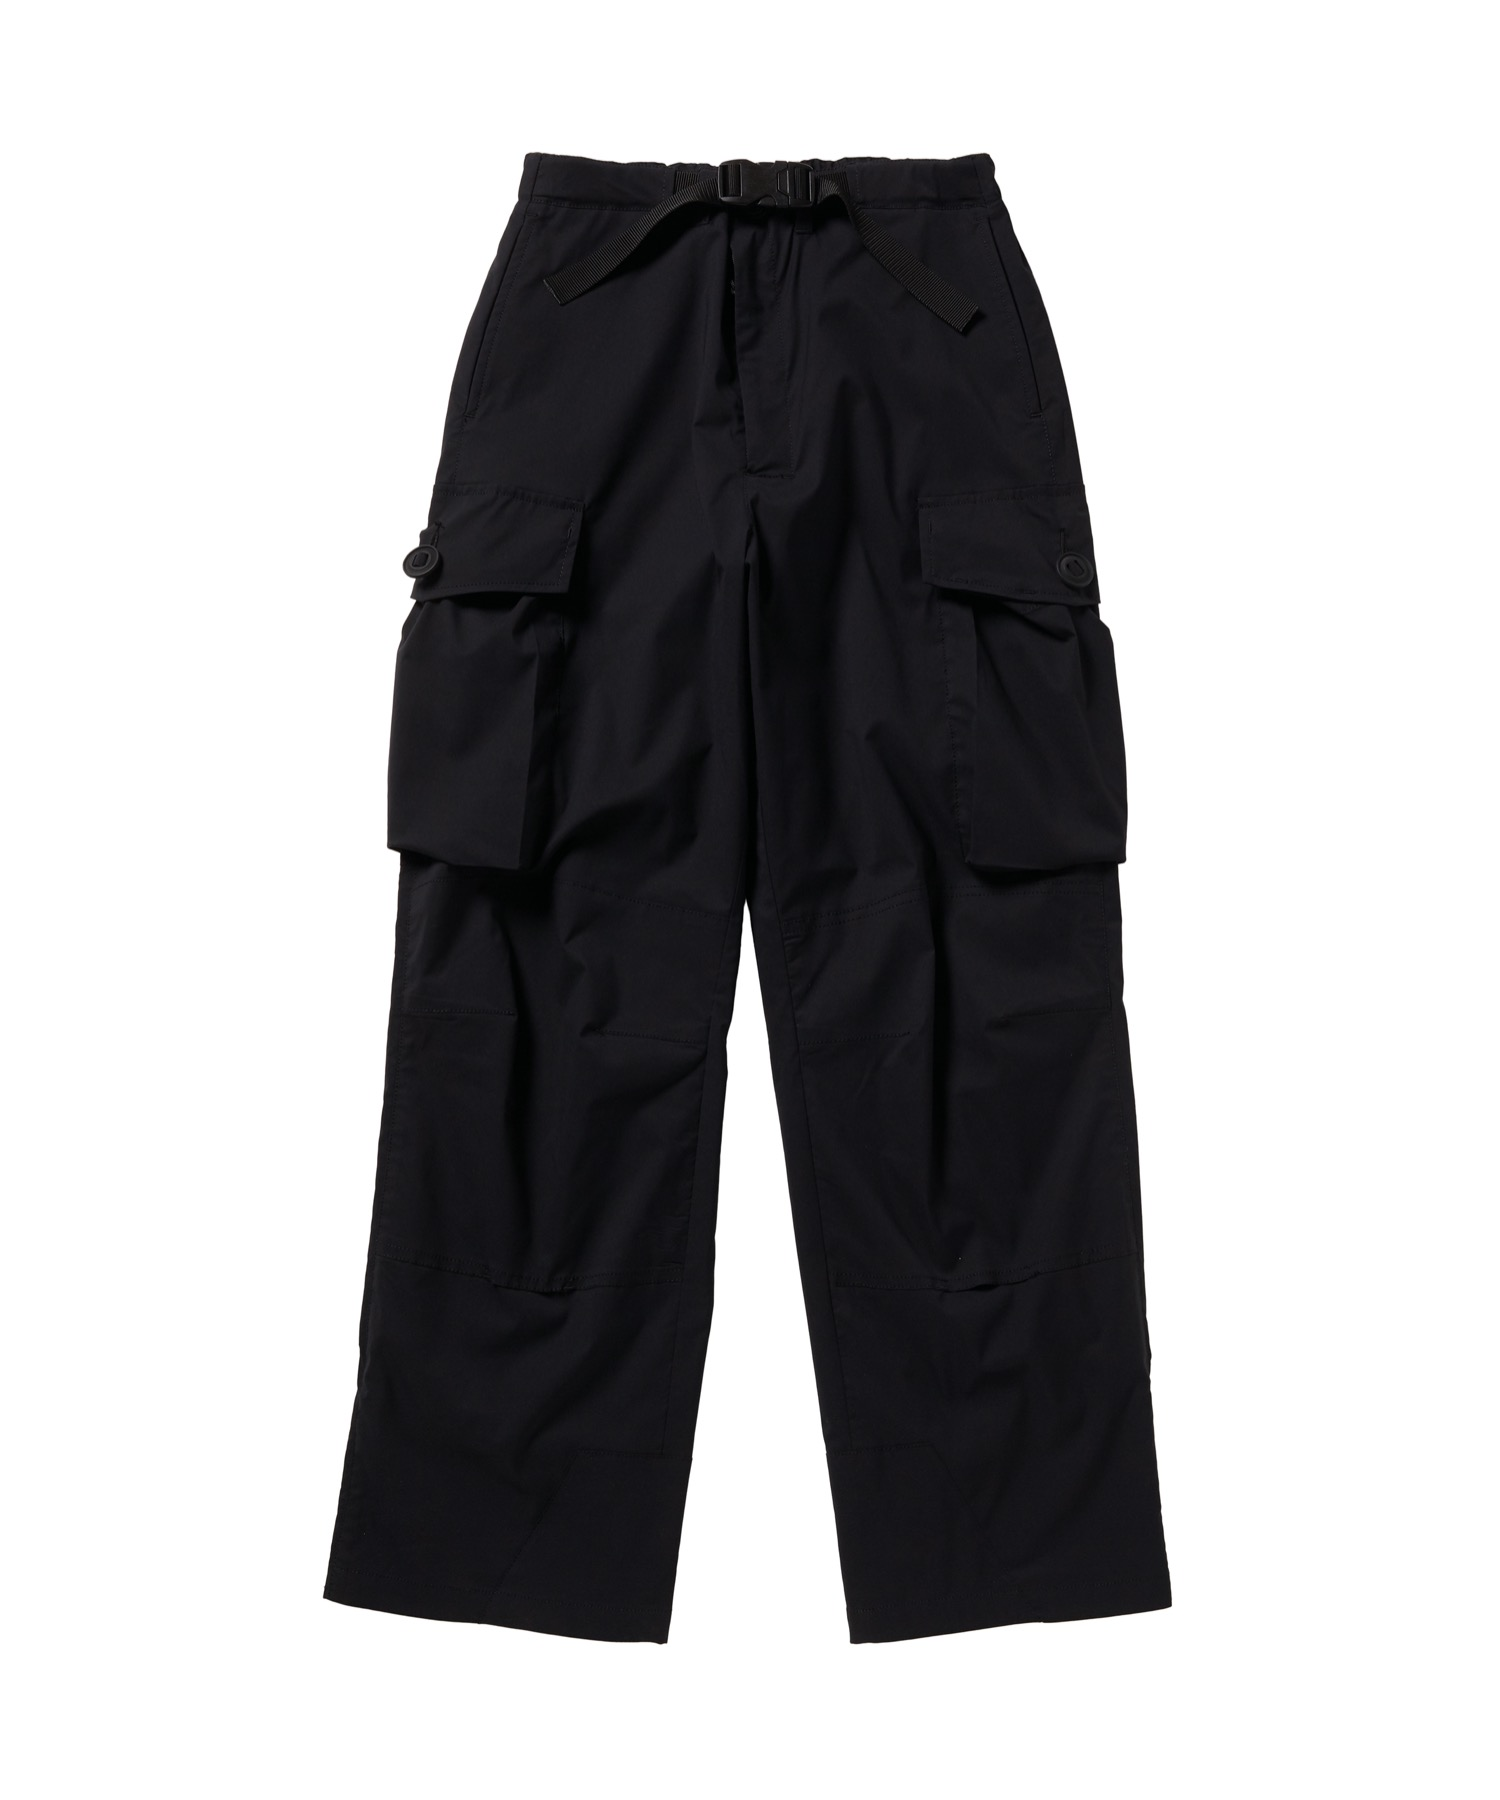 【N.HOOLYWOOD TEST PRODUCT EXCHANGE SERVICE × karrimor】MIRITARY PANTS